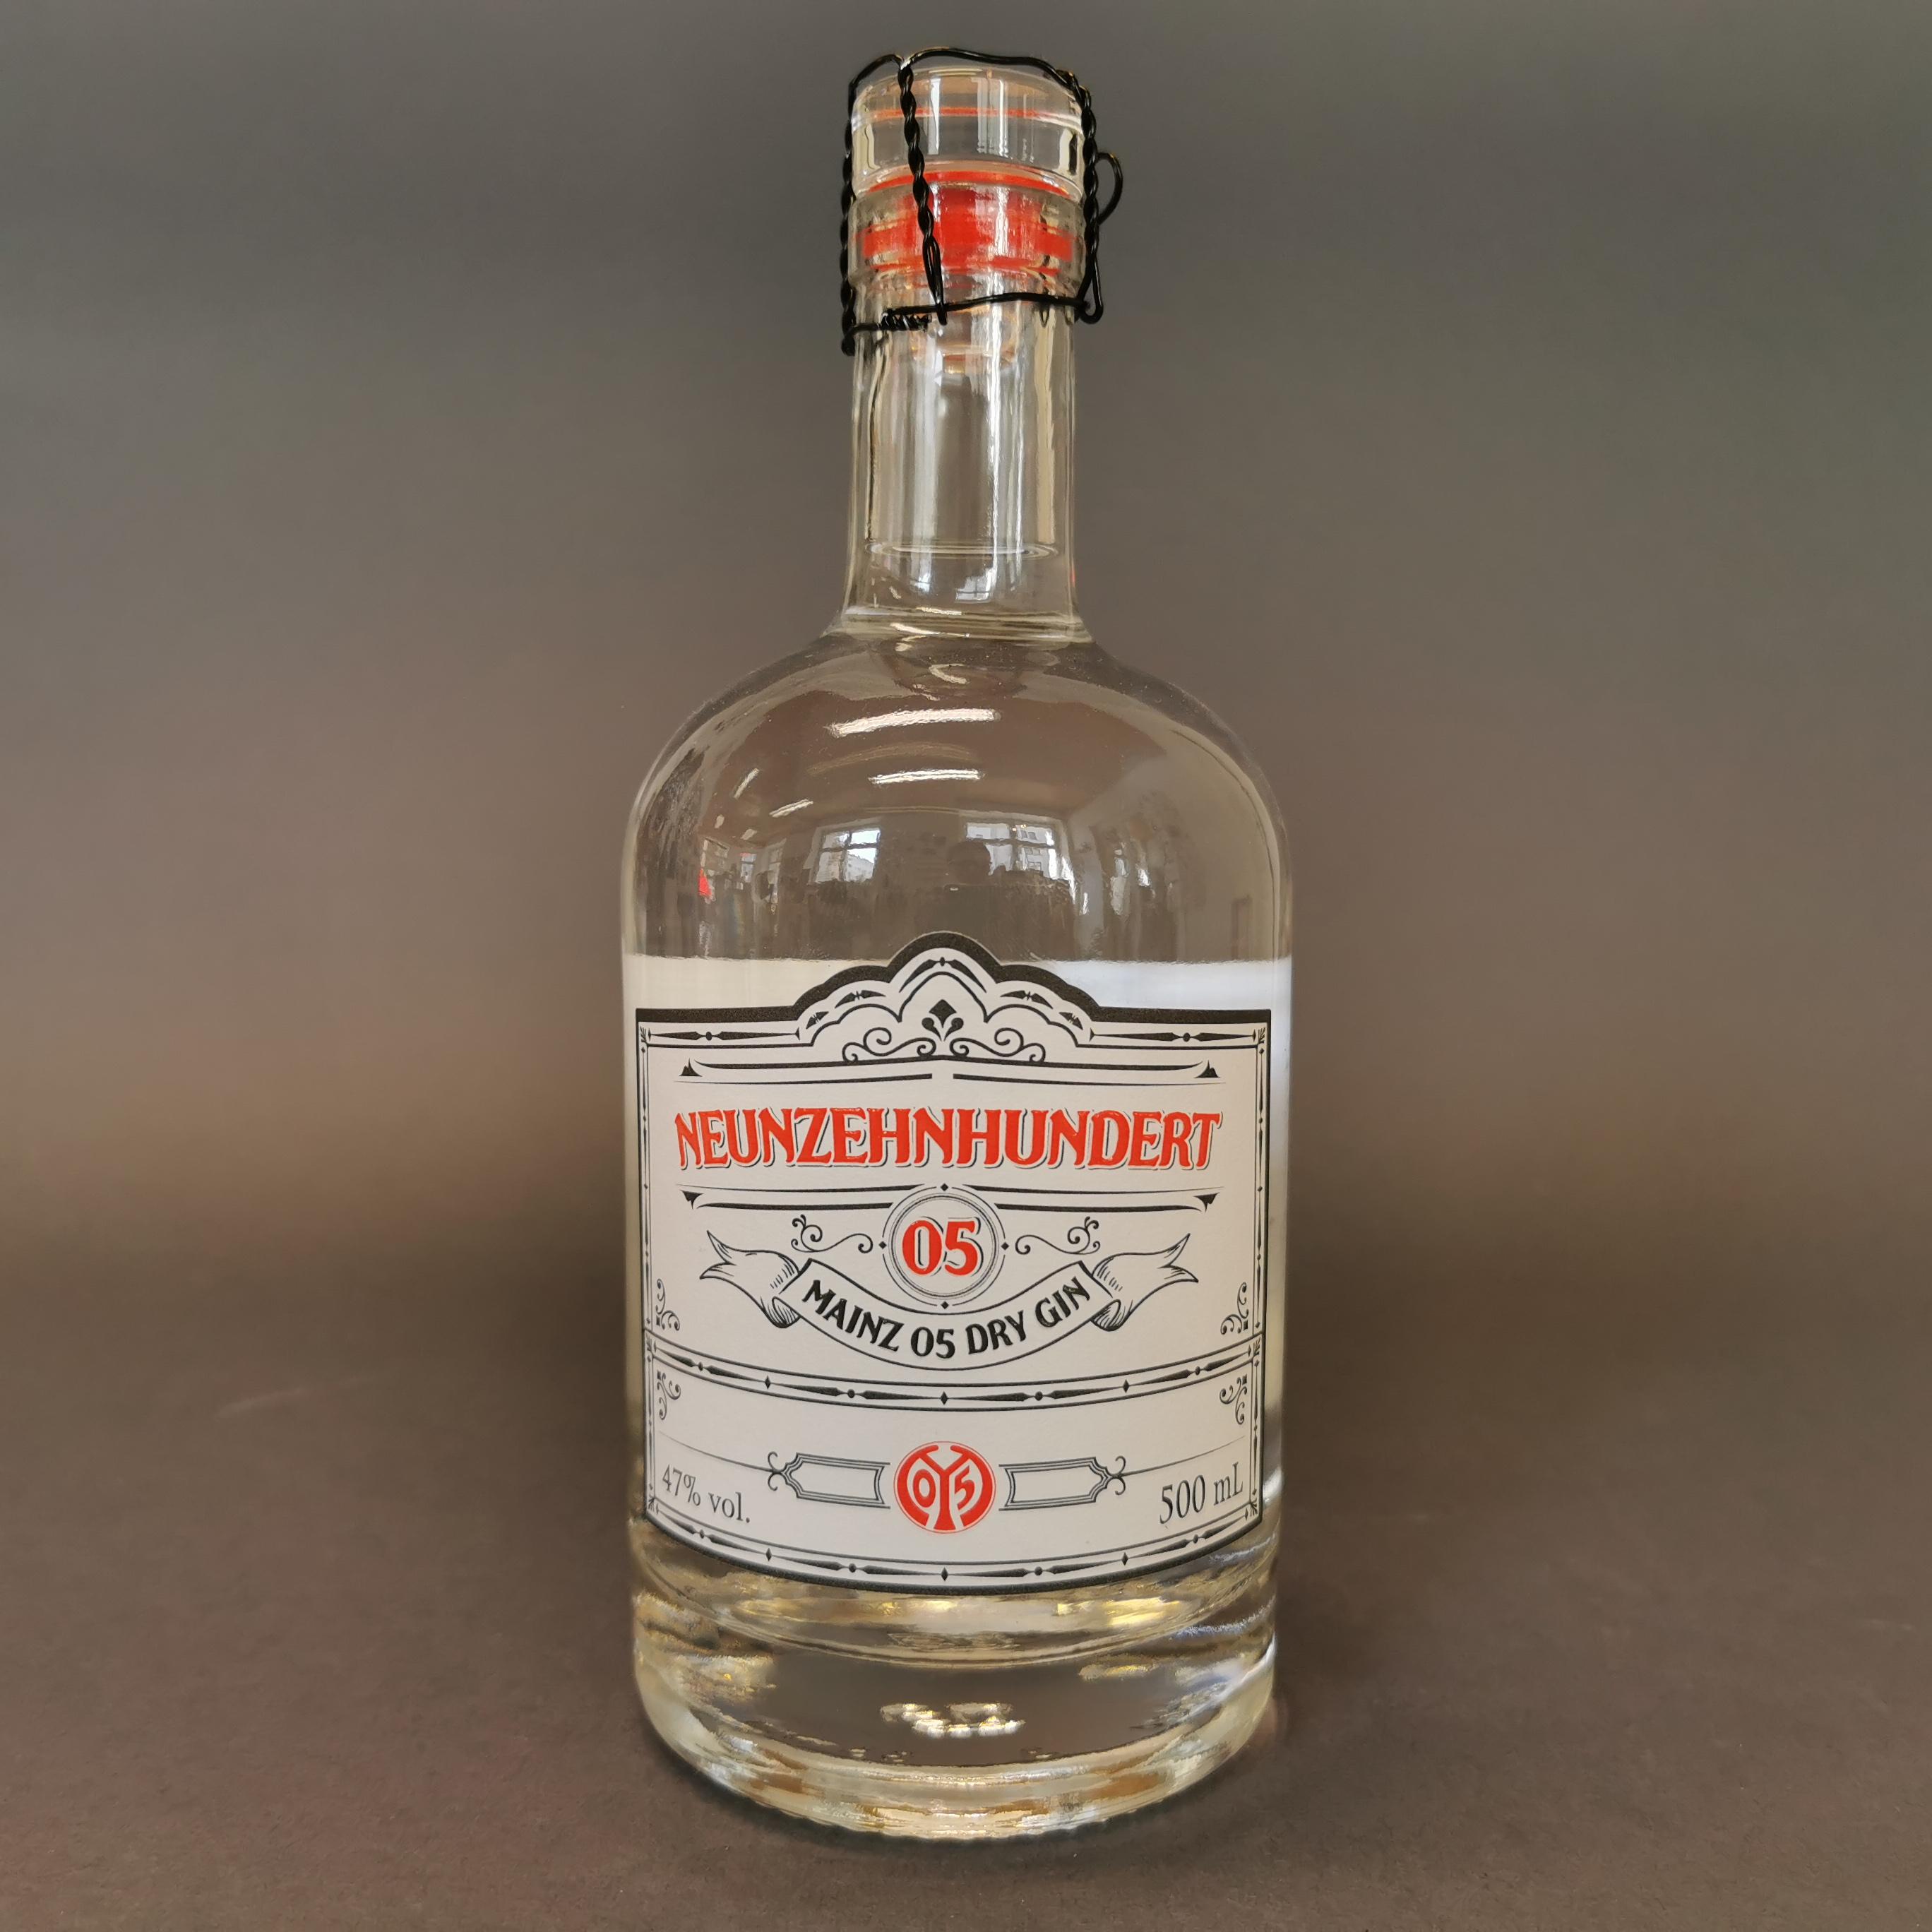 Neunzehnhundert 05 Dry Gin von Mainz 05